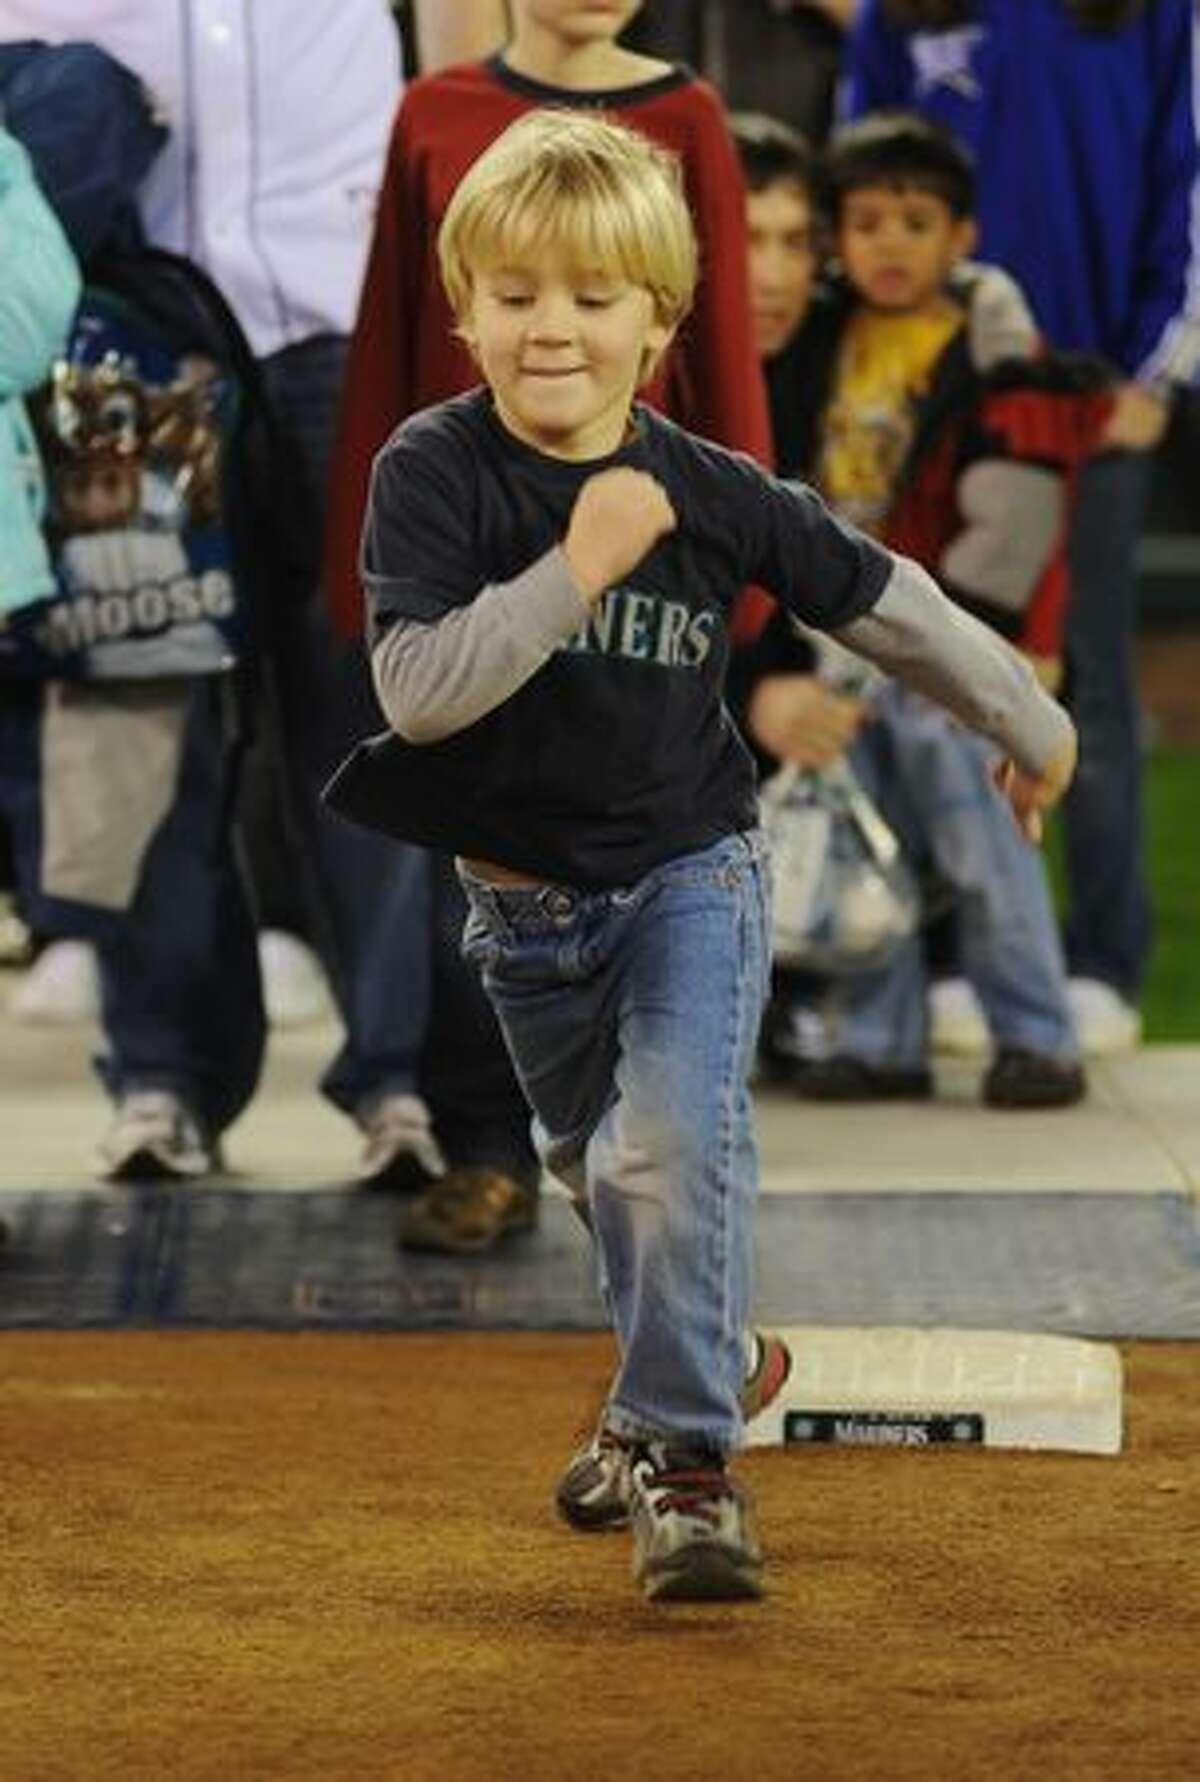 Fedya Henrichs, 5, runs the bases.